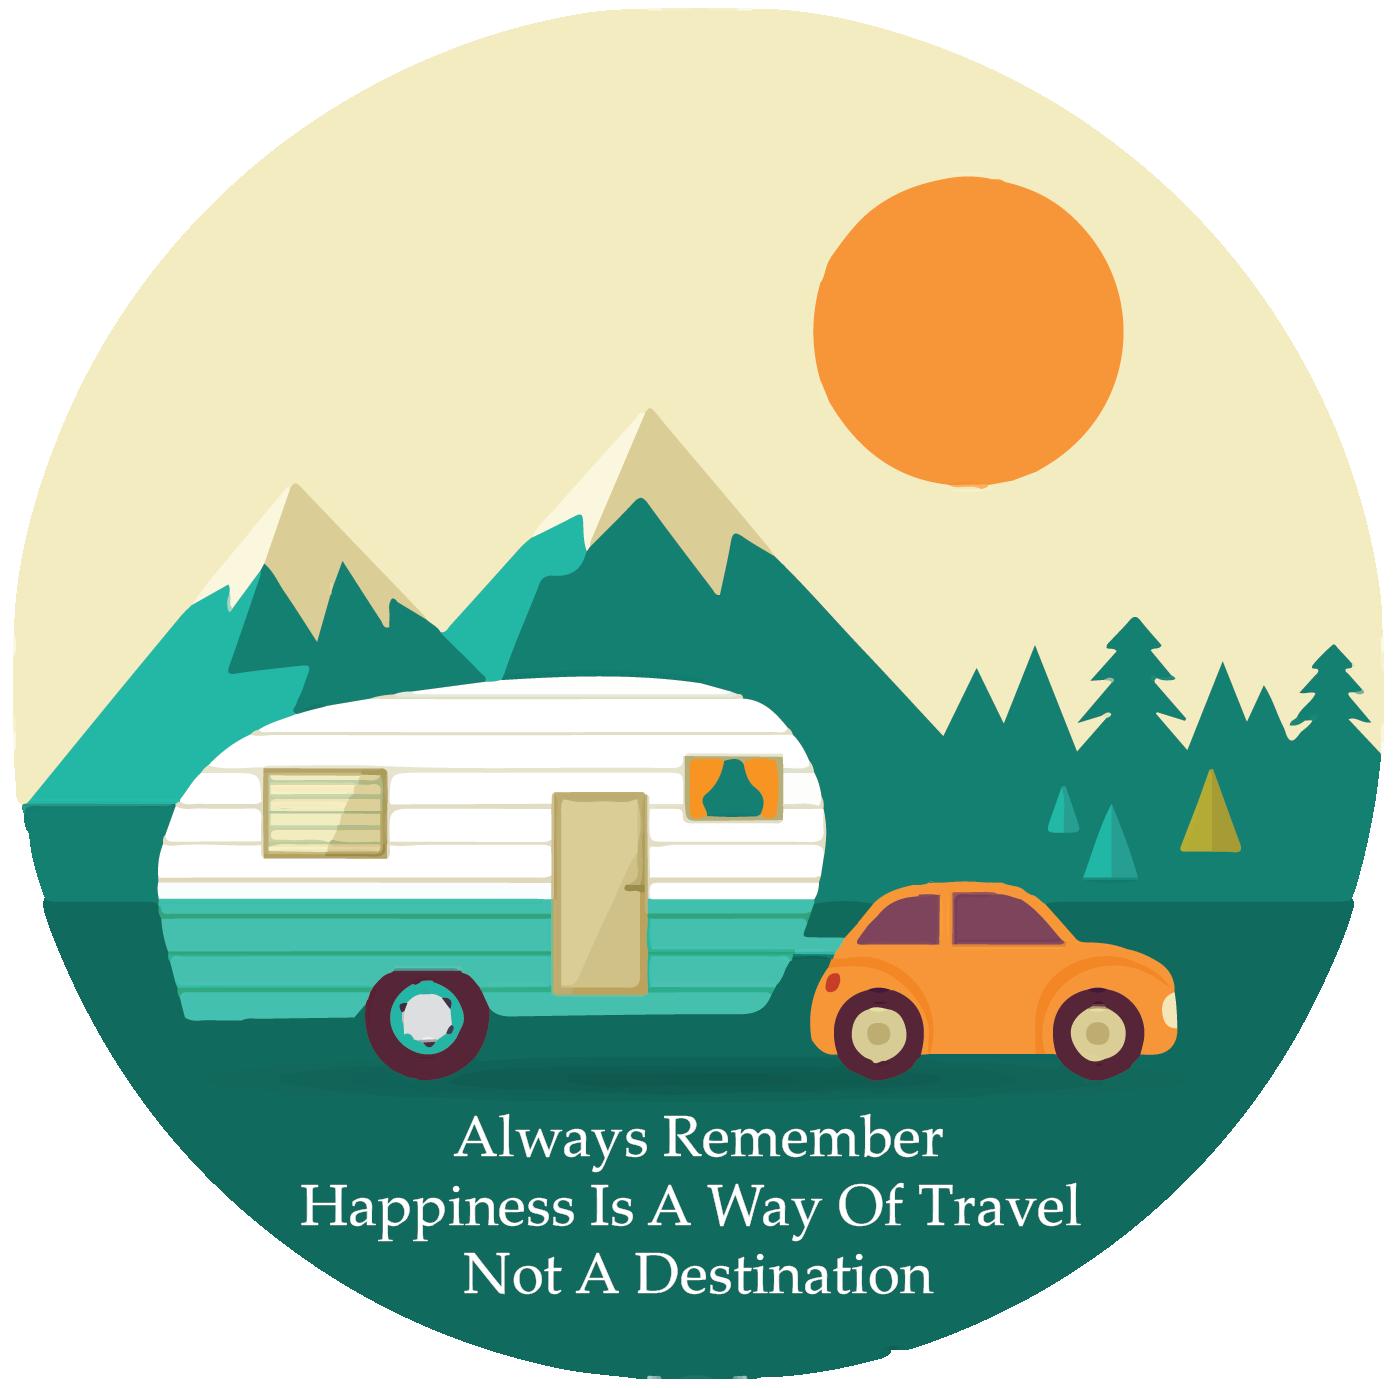 Wagon clipart trail tear. Rv rving camping lodging